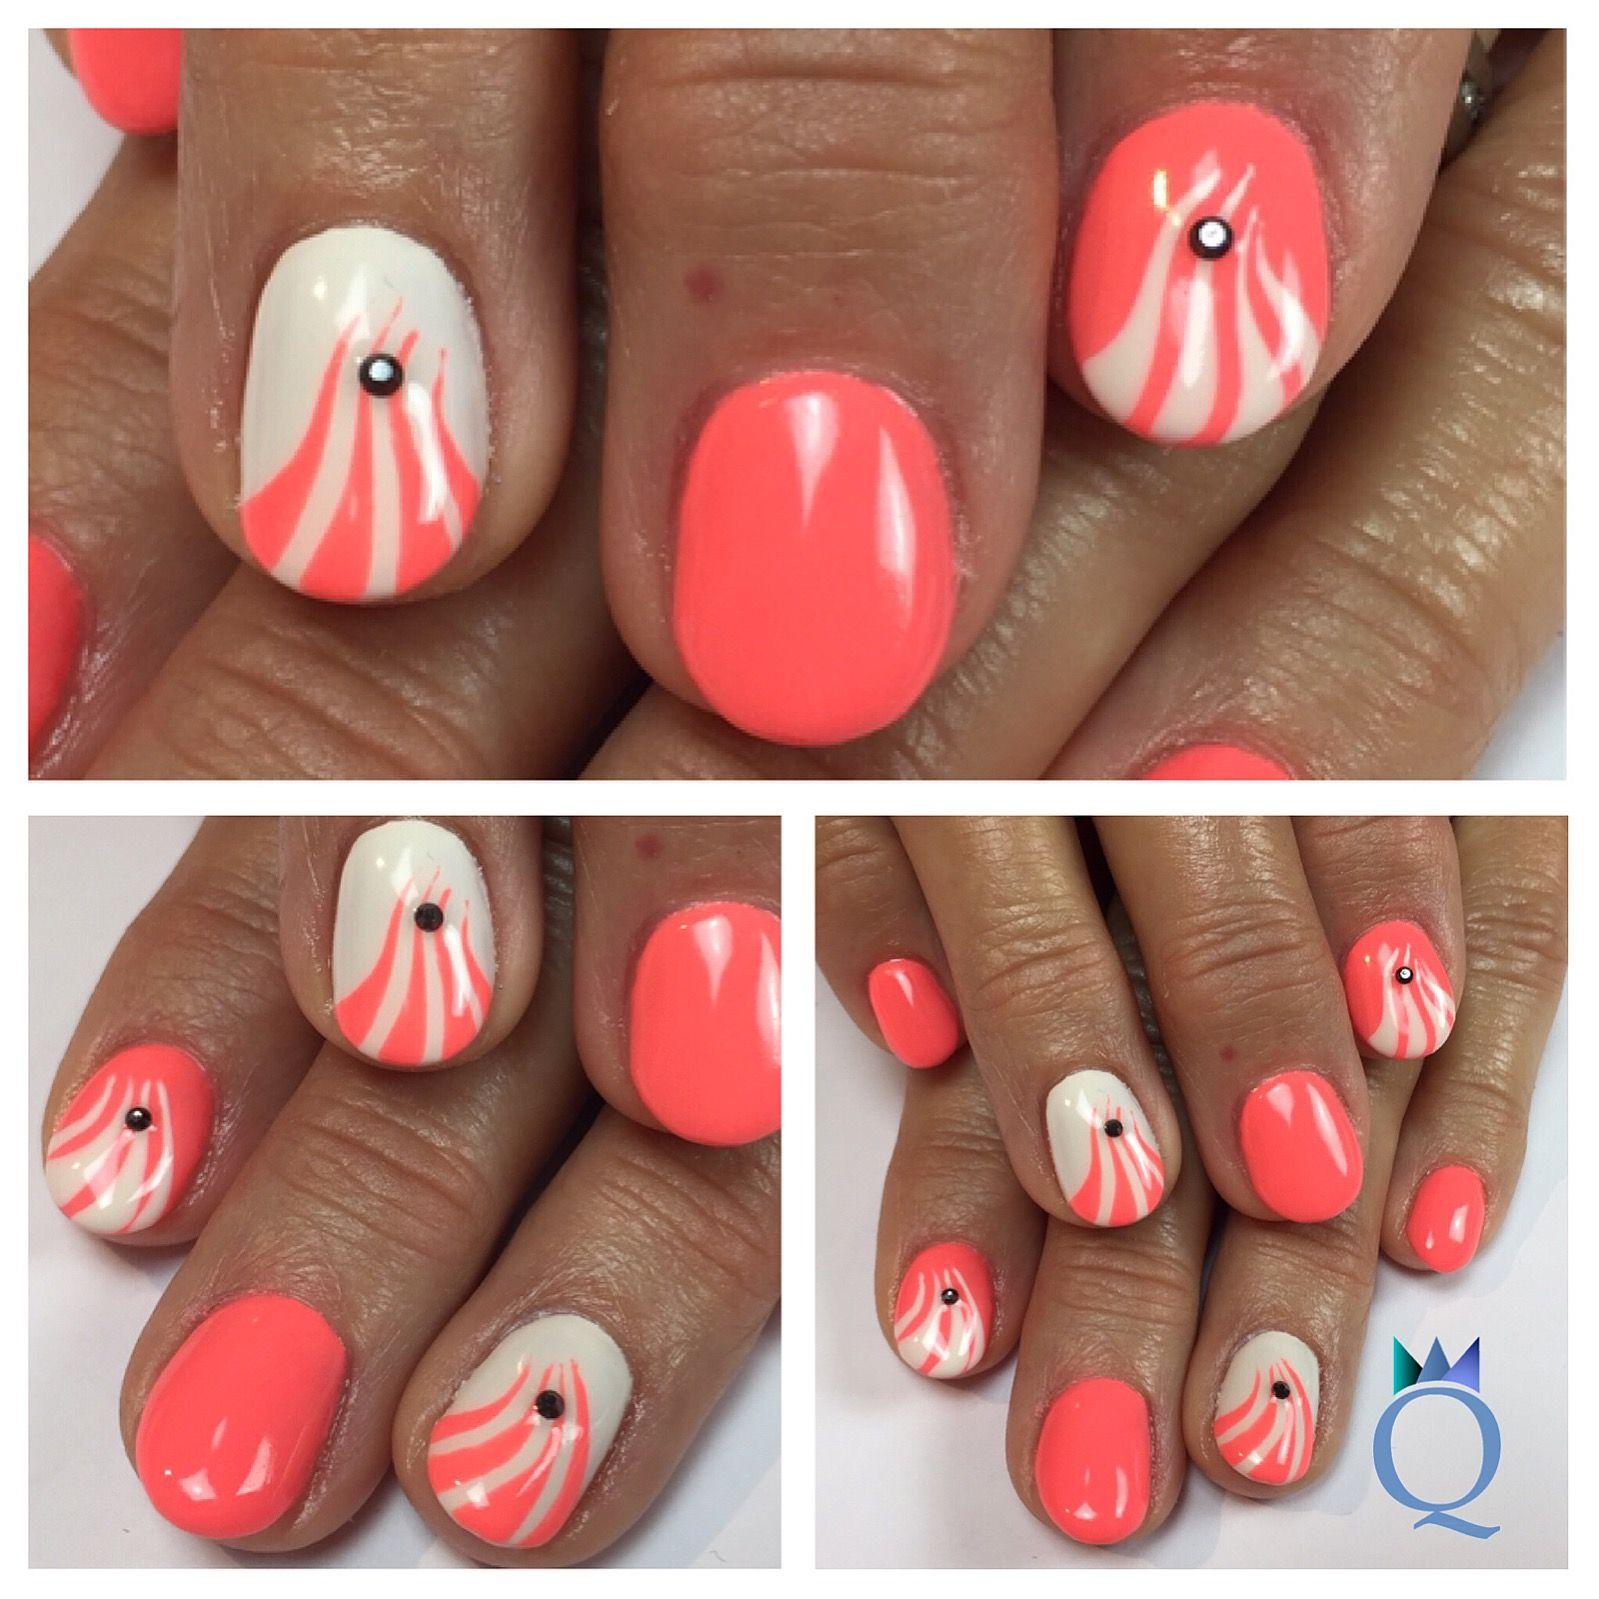 shortnails #gelnails #nails #coral #white #akyado #handpainted ...